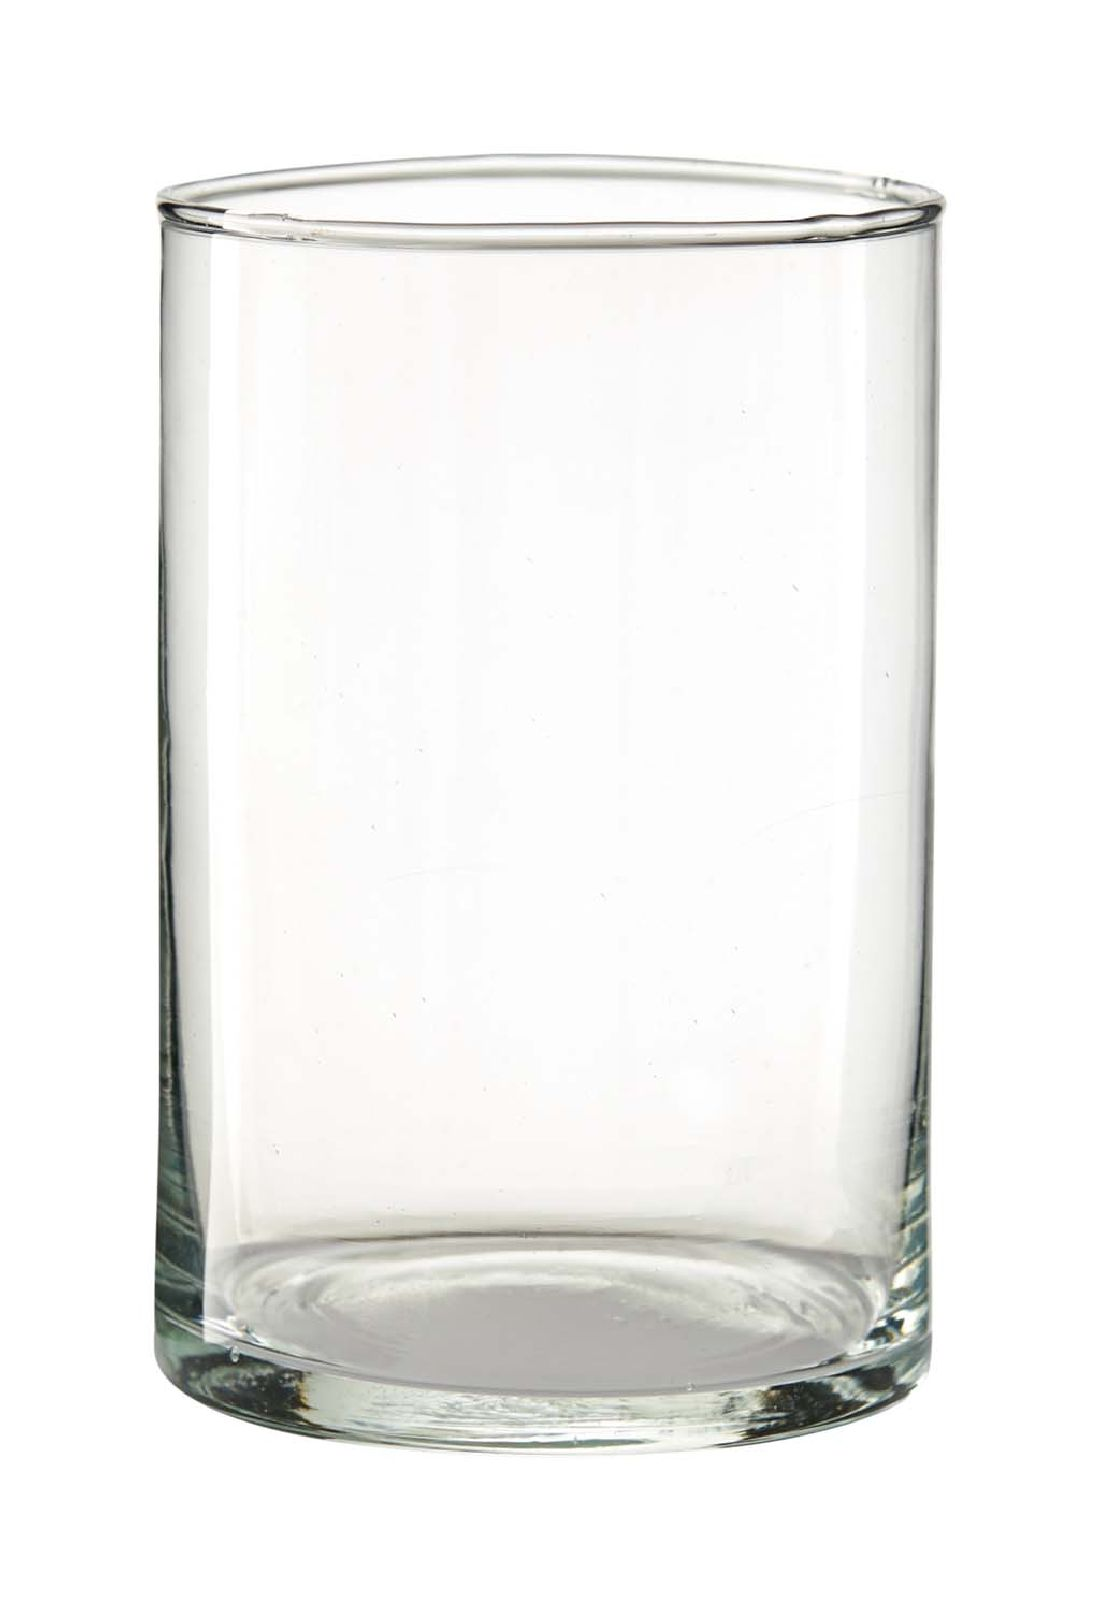 Zylinder Glas press KLAR 1850/30 Ø10cm x H30cm